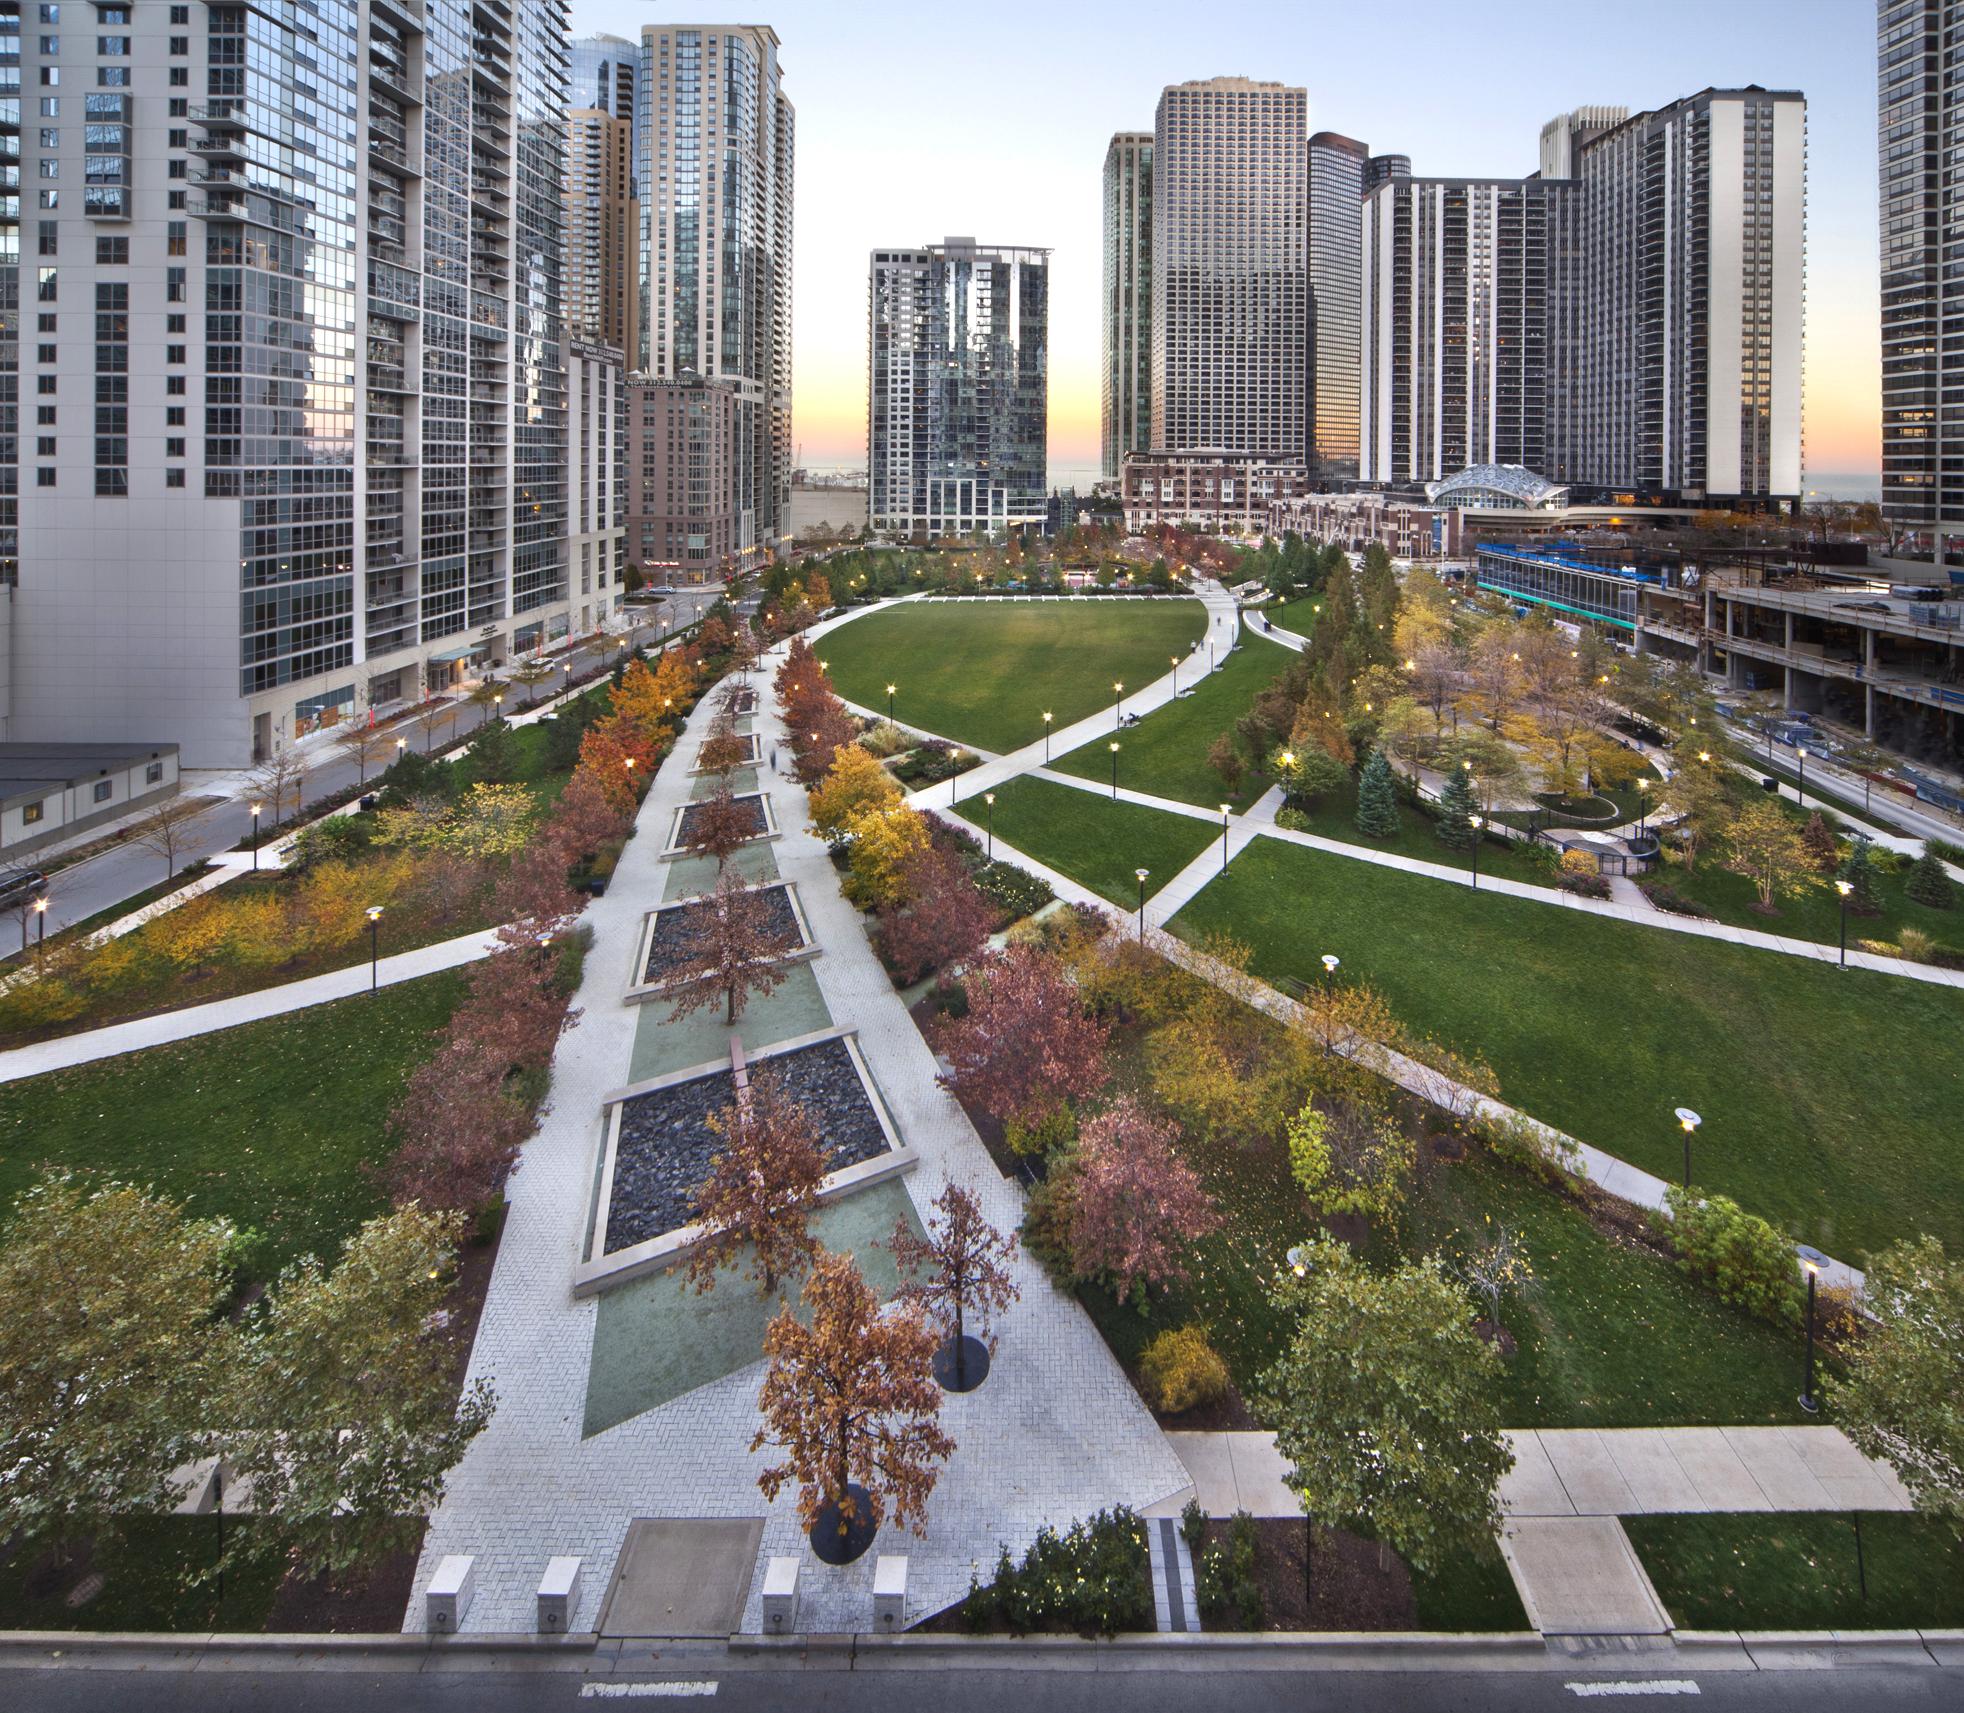 Lakeshore East Park: Winner of the ILASLA 2020 Landmark Award